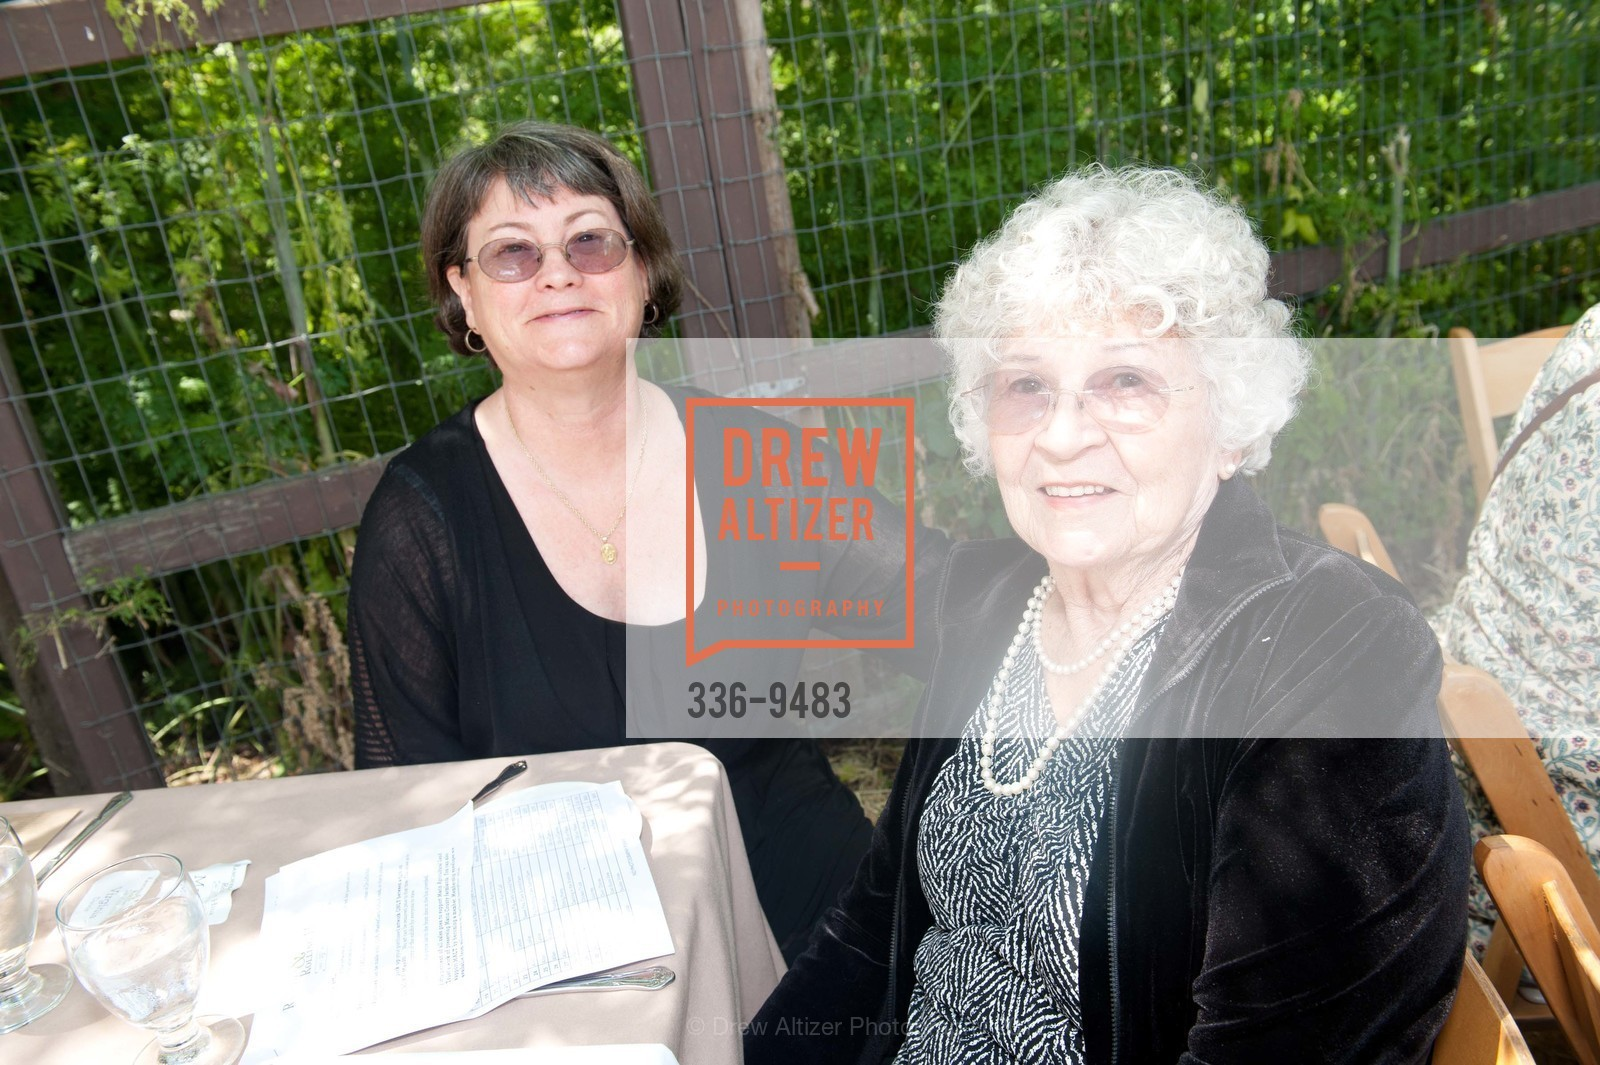 Laura San Giacomo,Judith Allen Adult nude Vanessa Redgrave (born 1937),Jean Lodge